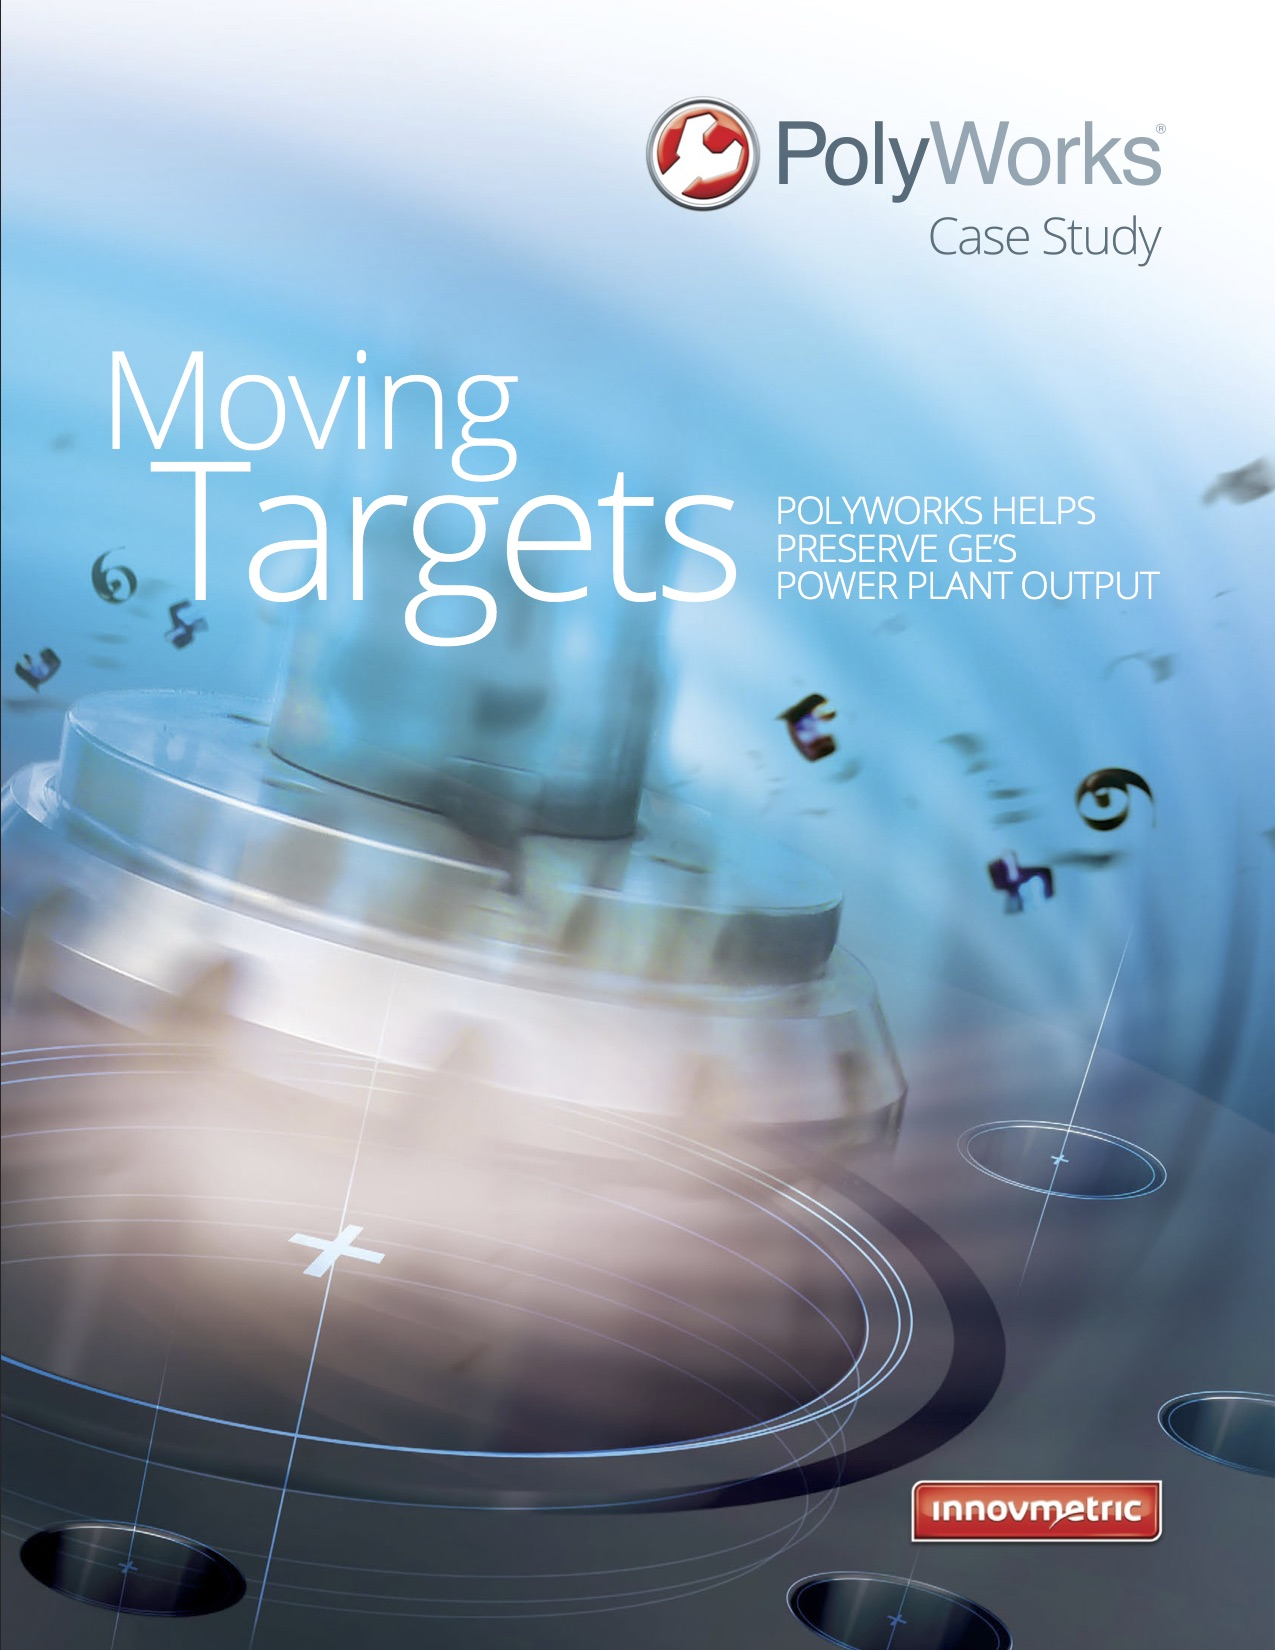 PolyWorks Case Study